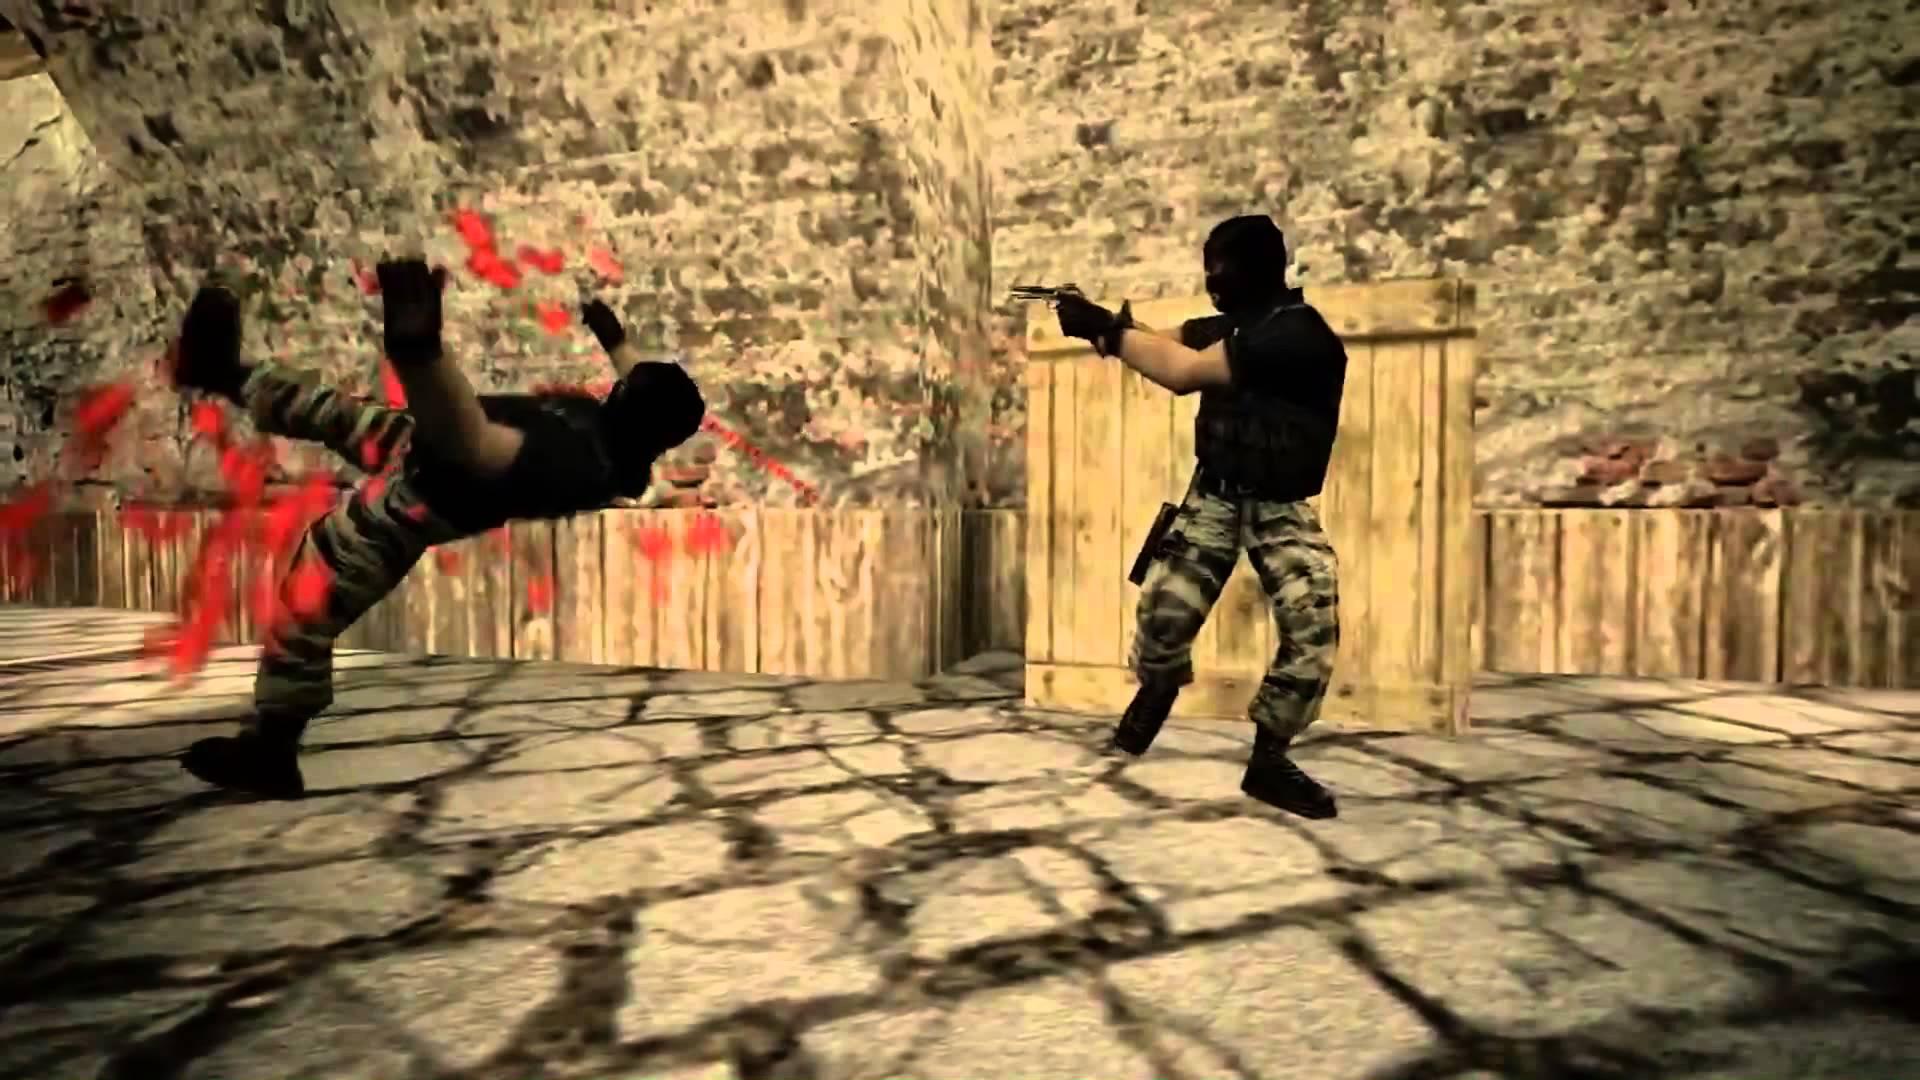 Counter-Strike 16 - Counter-Strike 16 Download